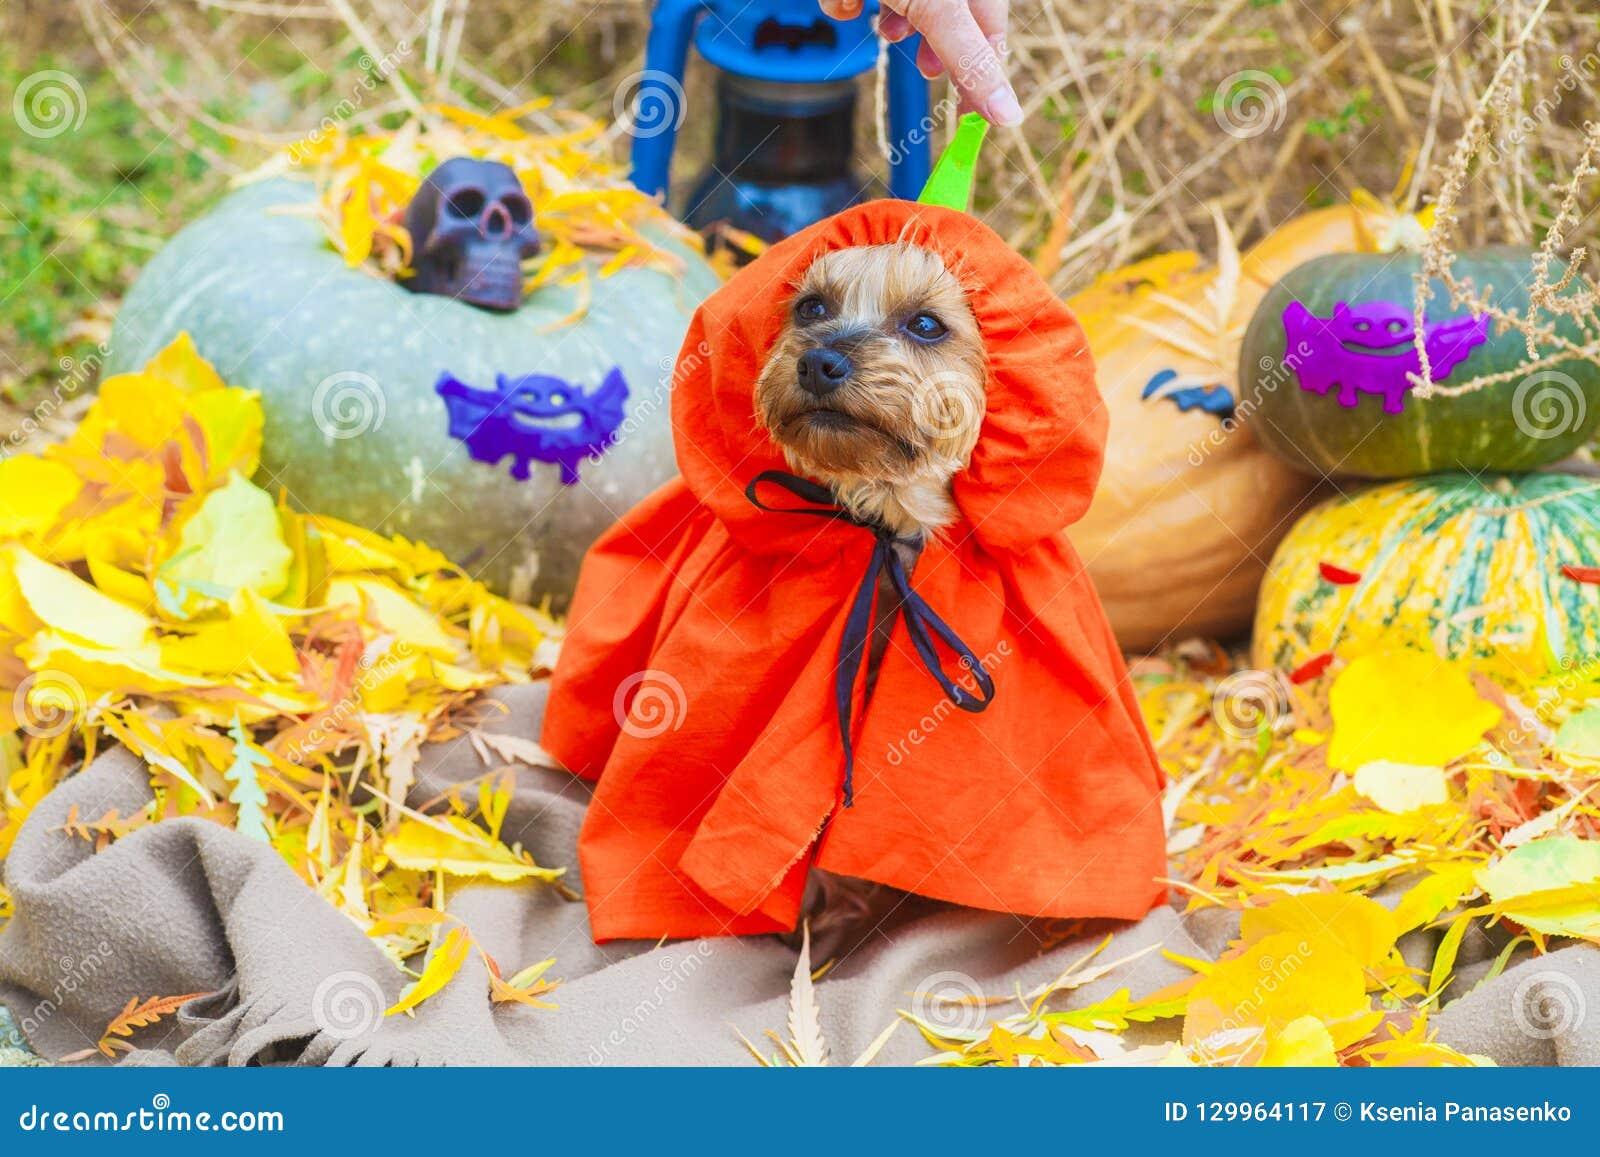 Halloween Yorkshire terrier in pumpkin costume looking at side